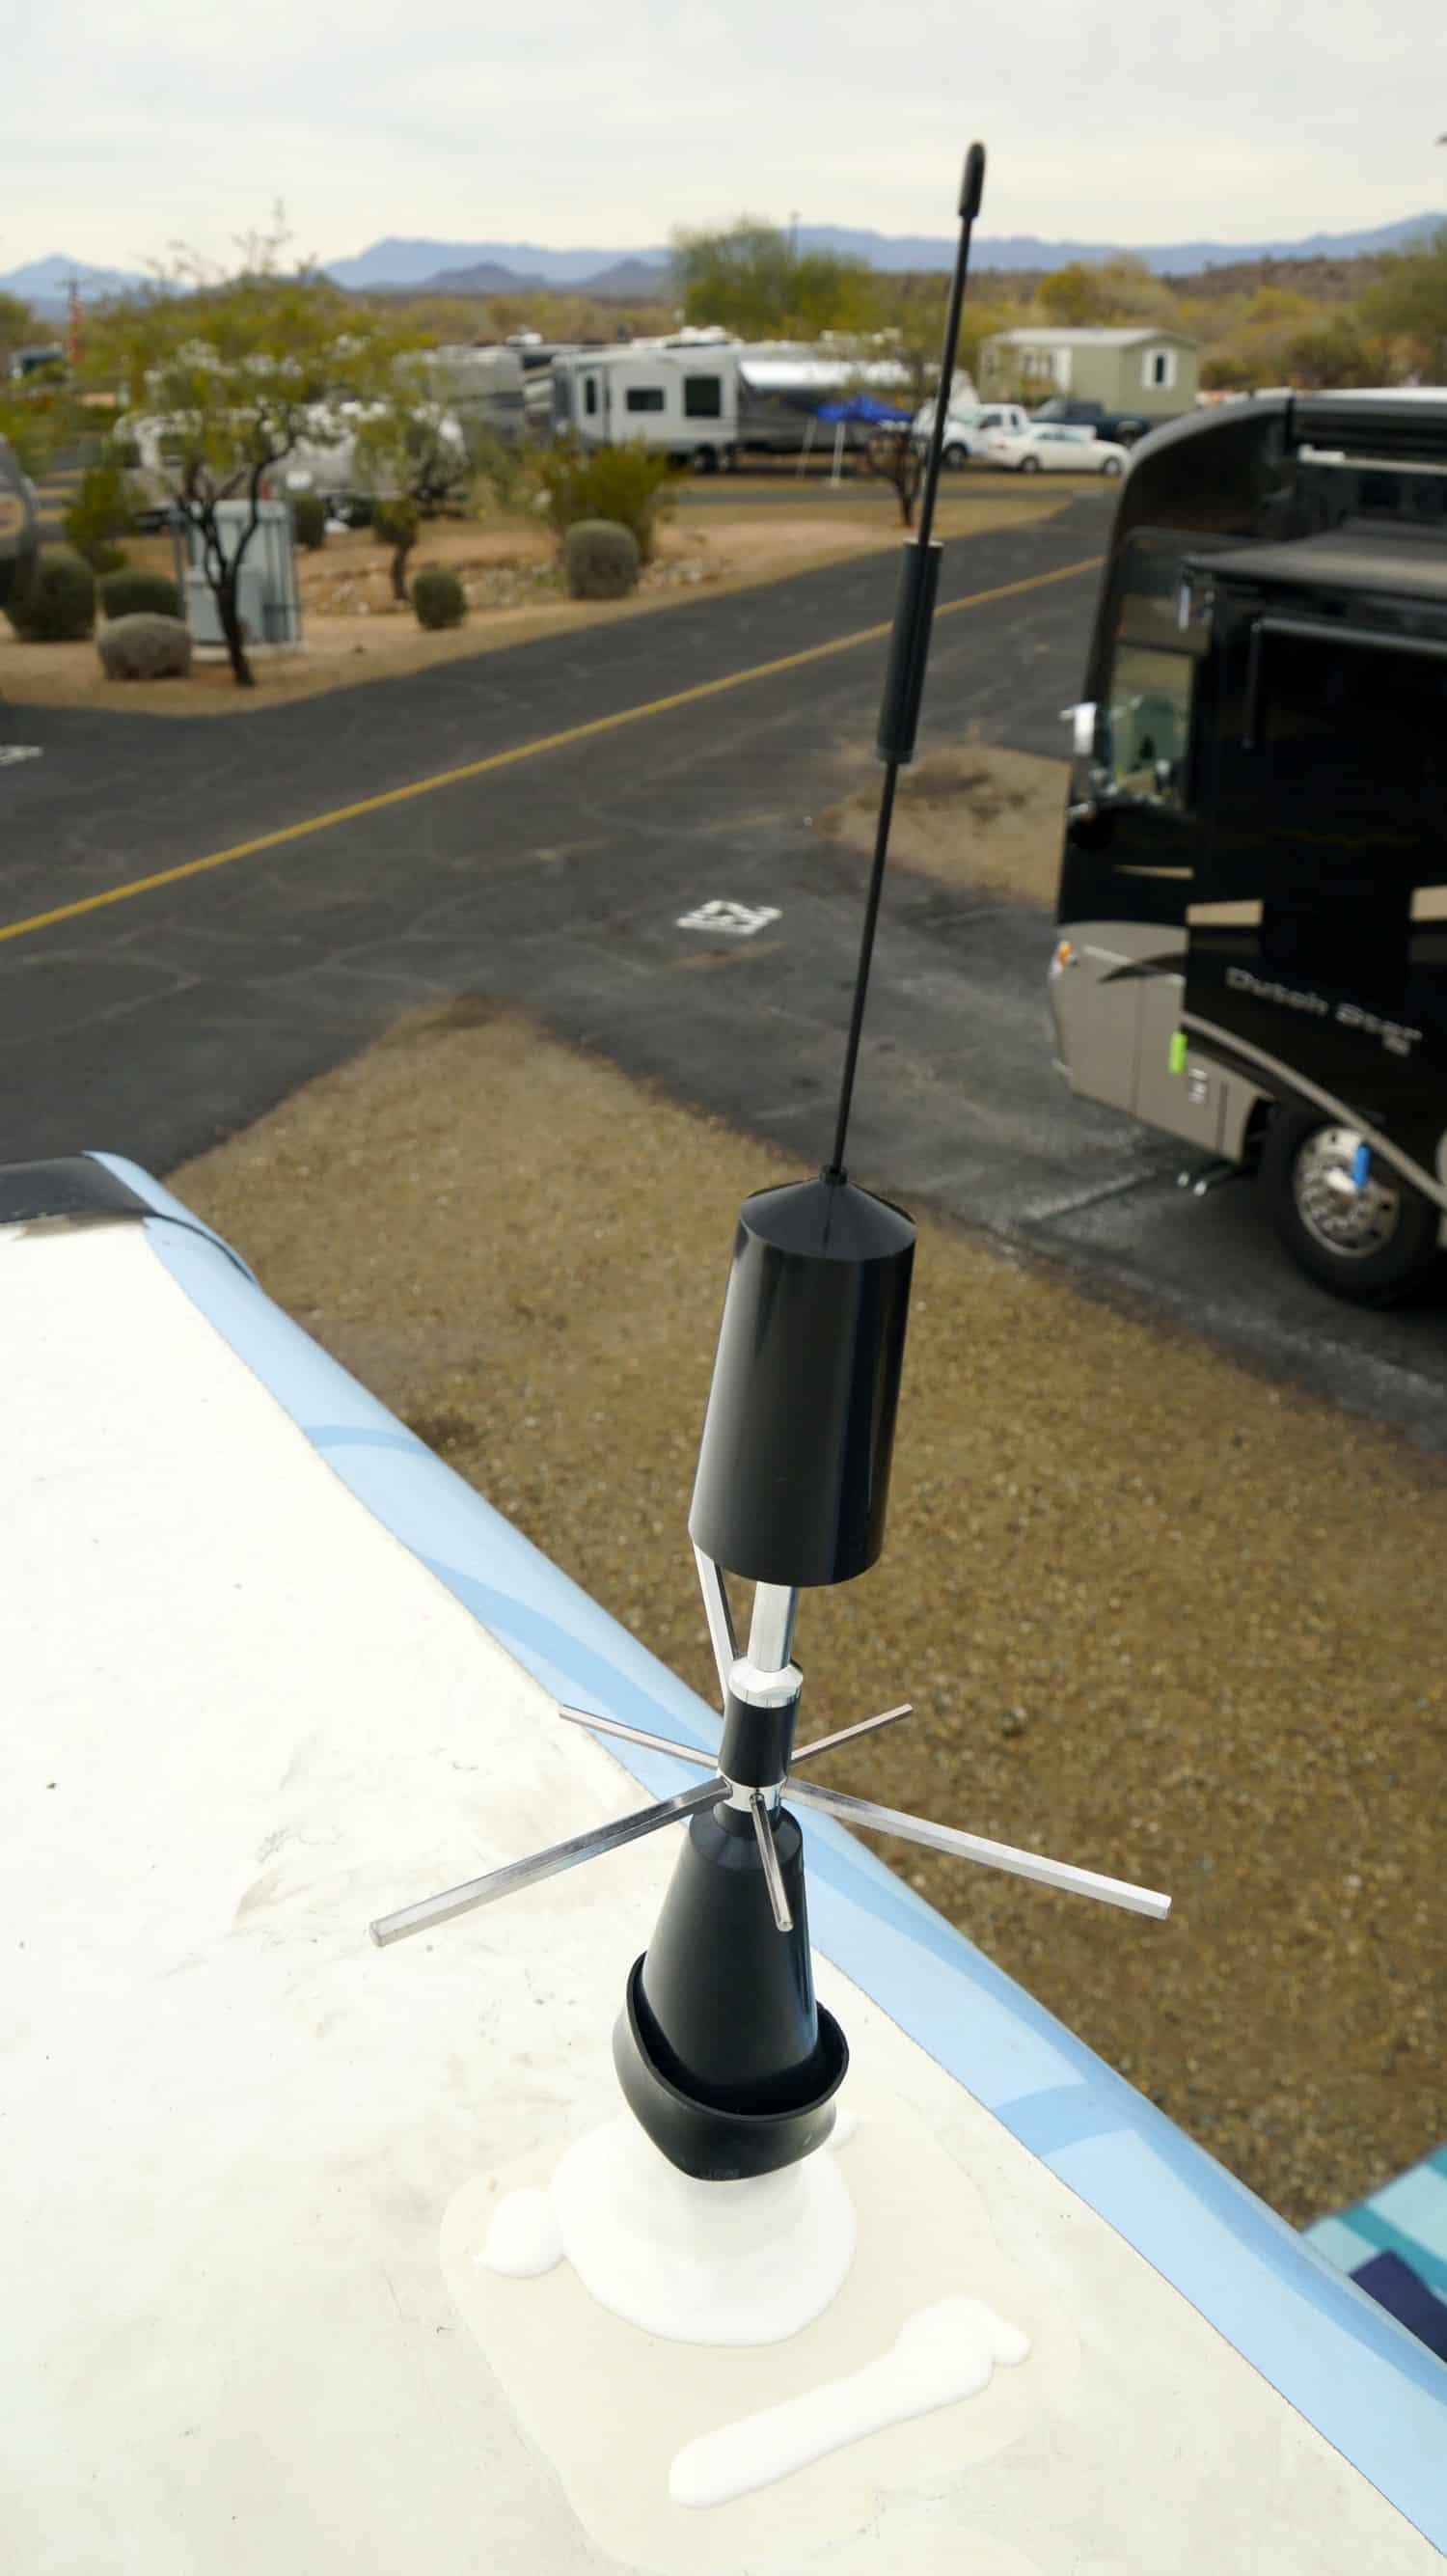 Wilson Trucker's Antenna on the roof of the GoPetFriendly.com Winnebago motorhome